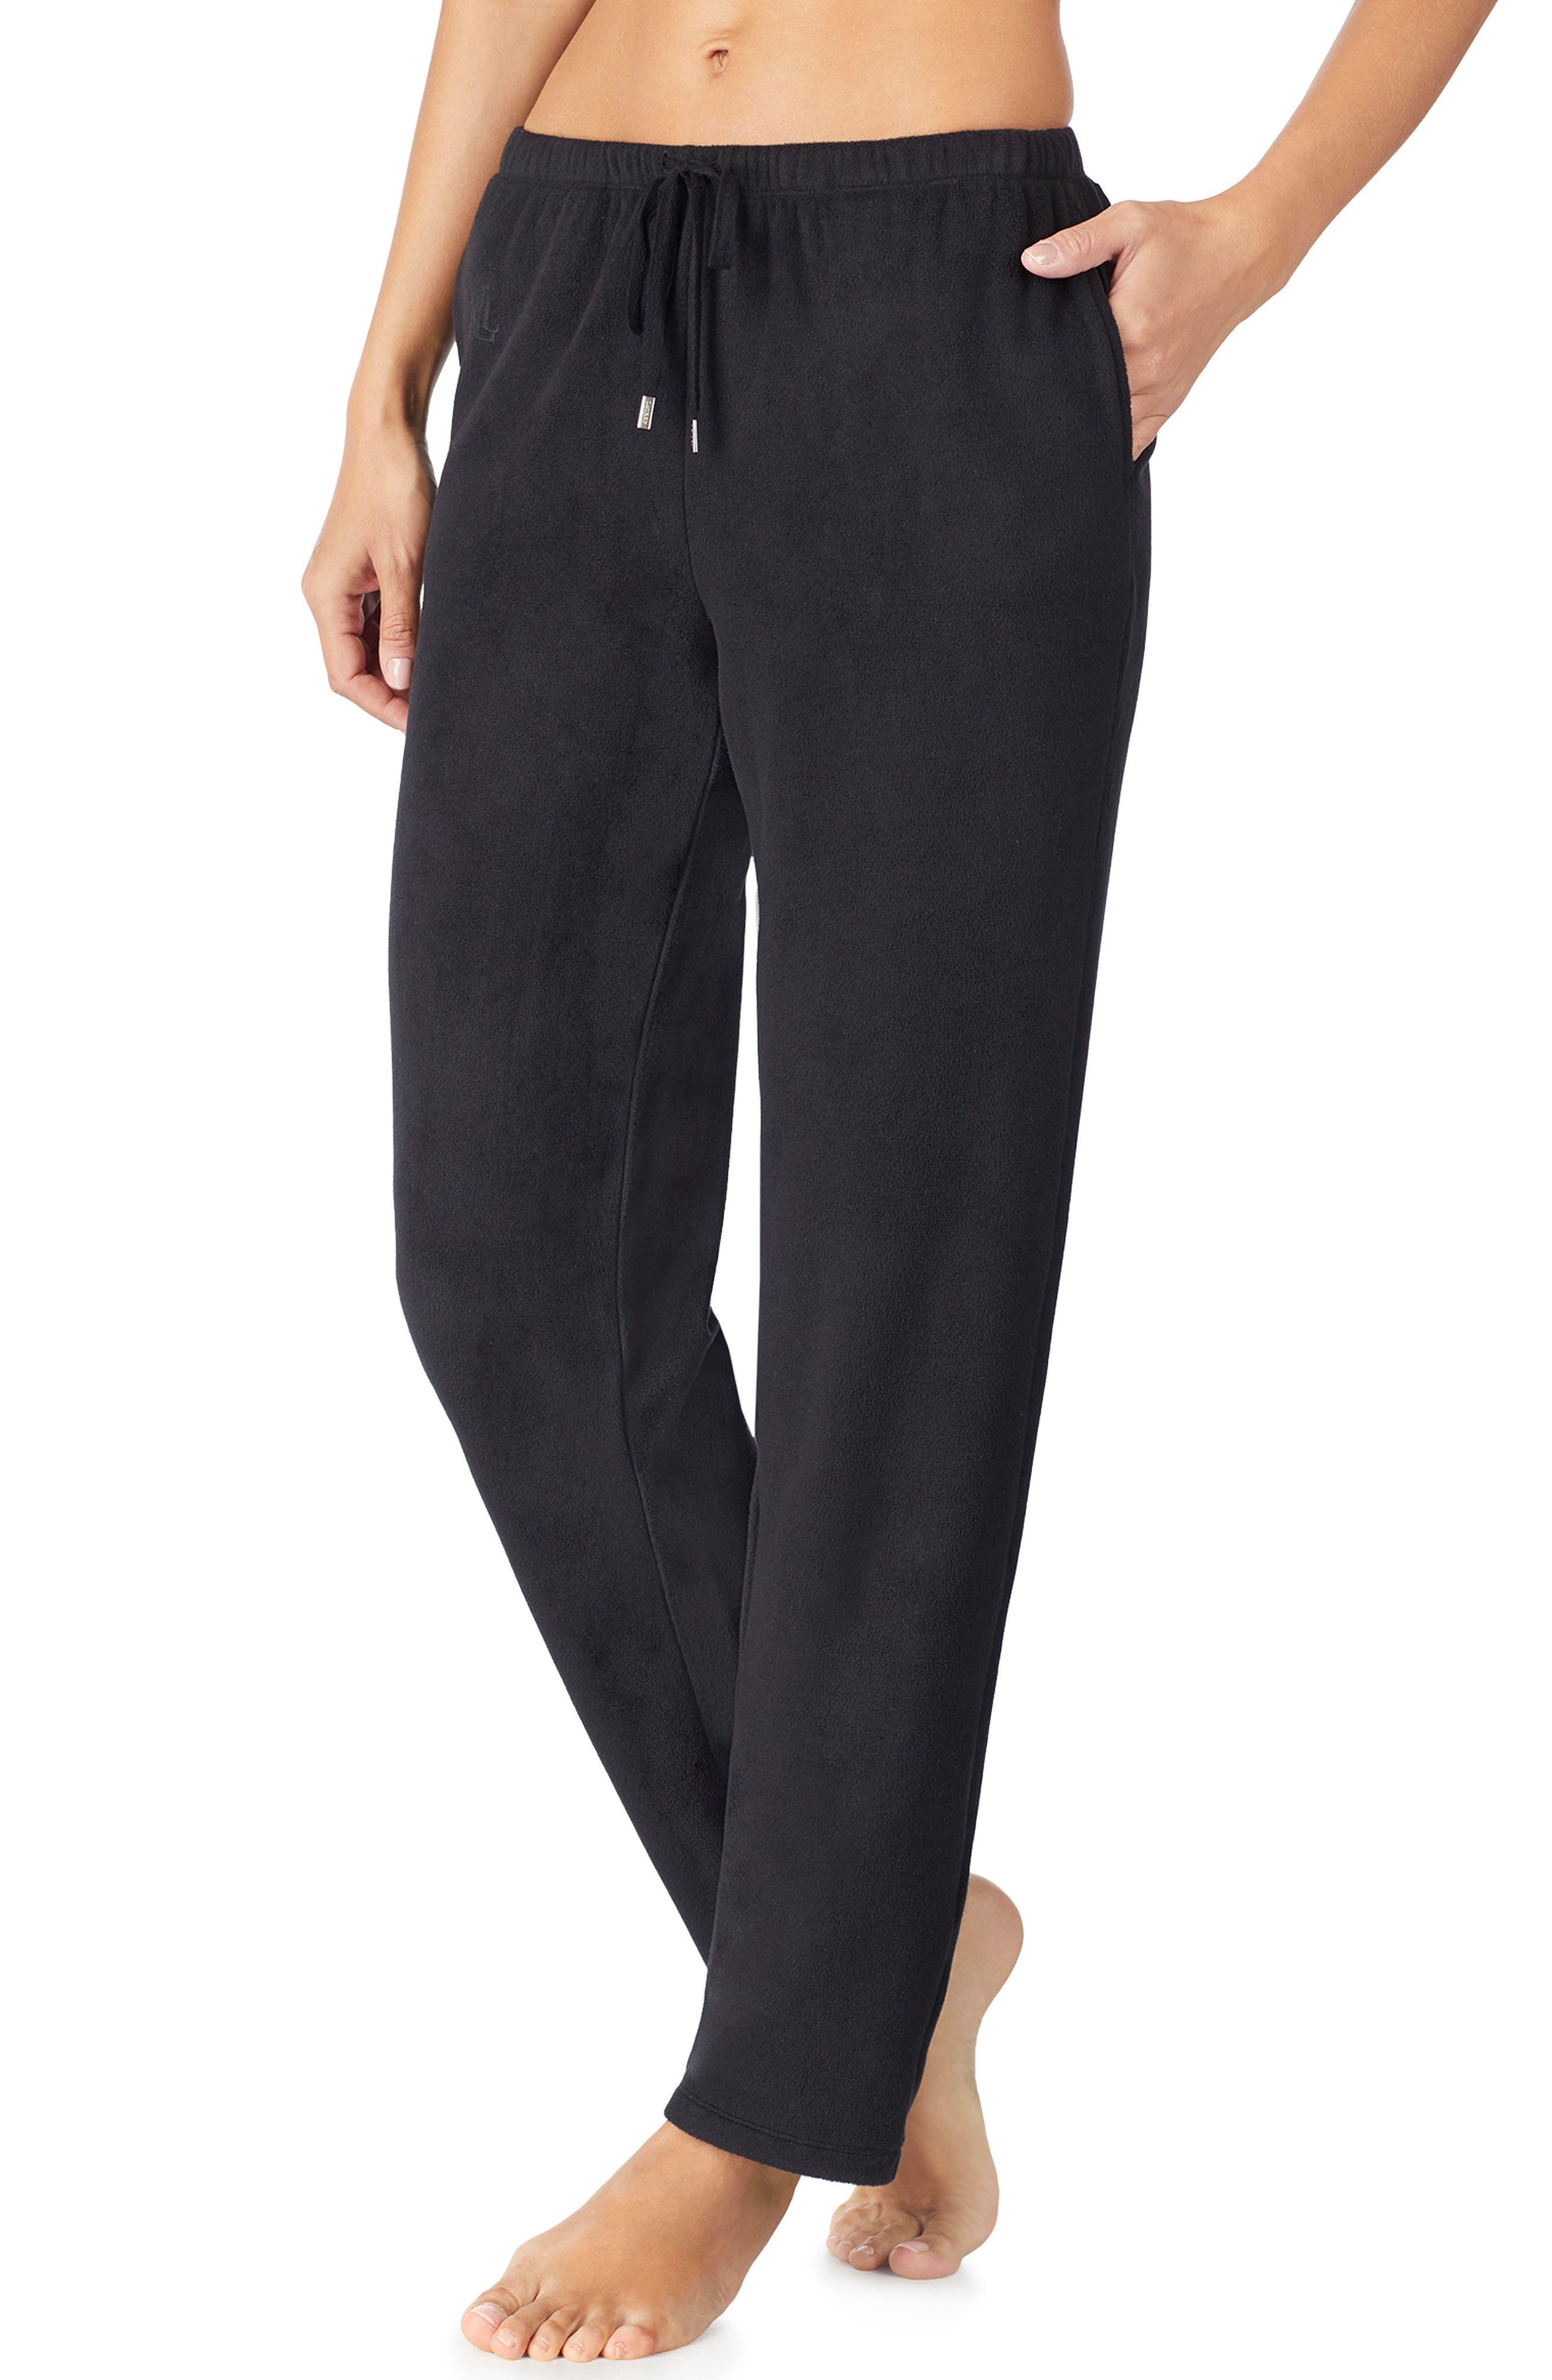 LAUREN RALPH LAUREN Lounge Pants, Main, color, BLACK